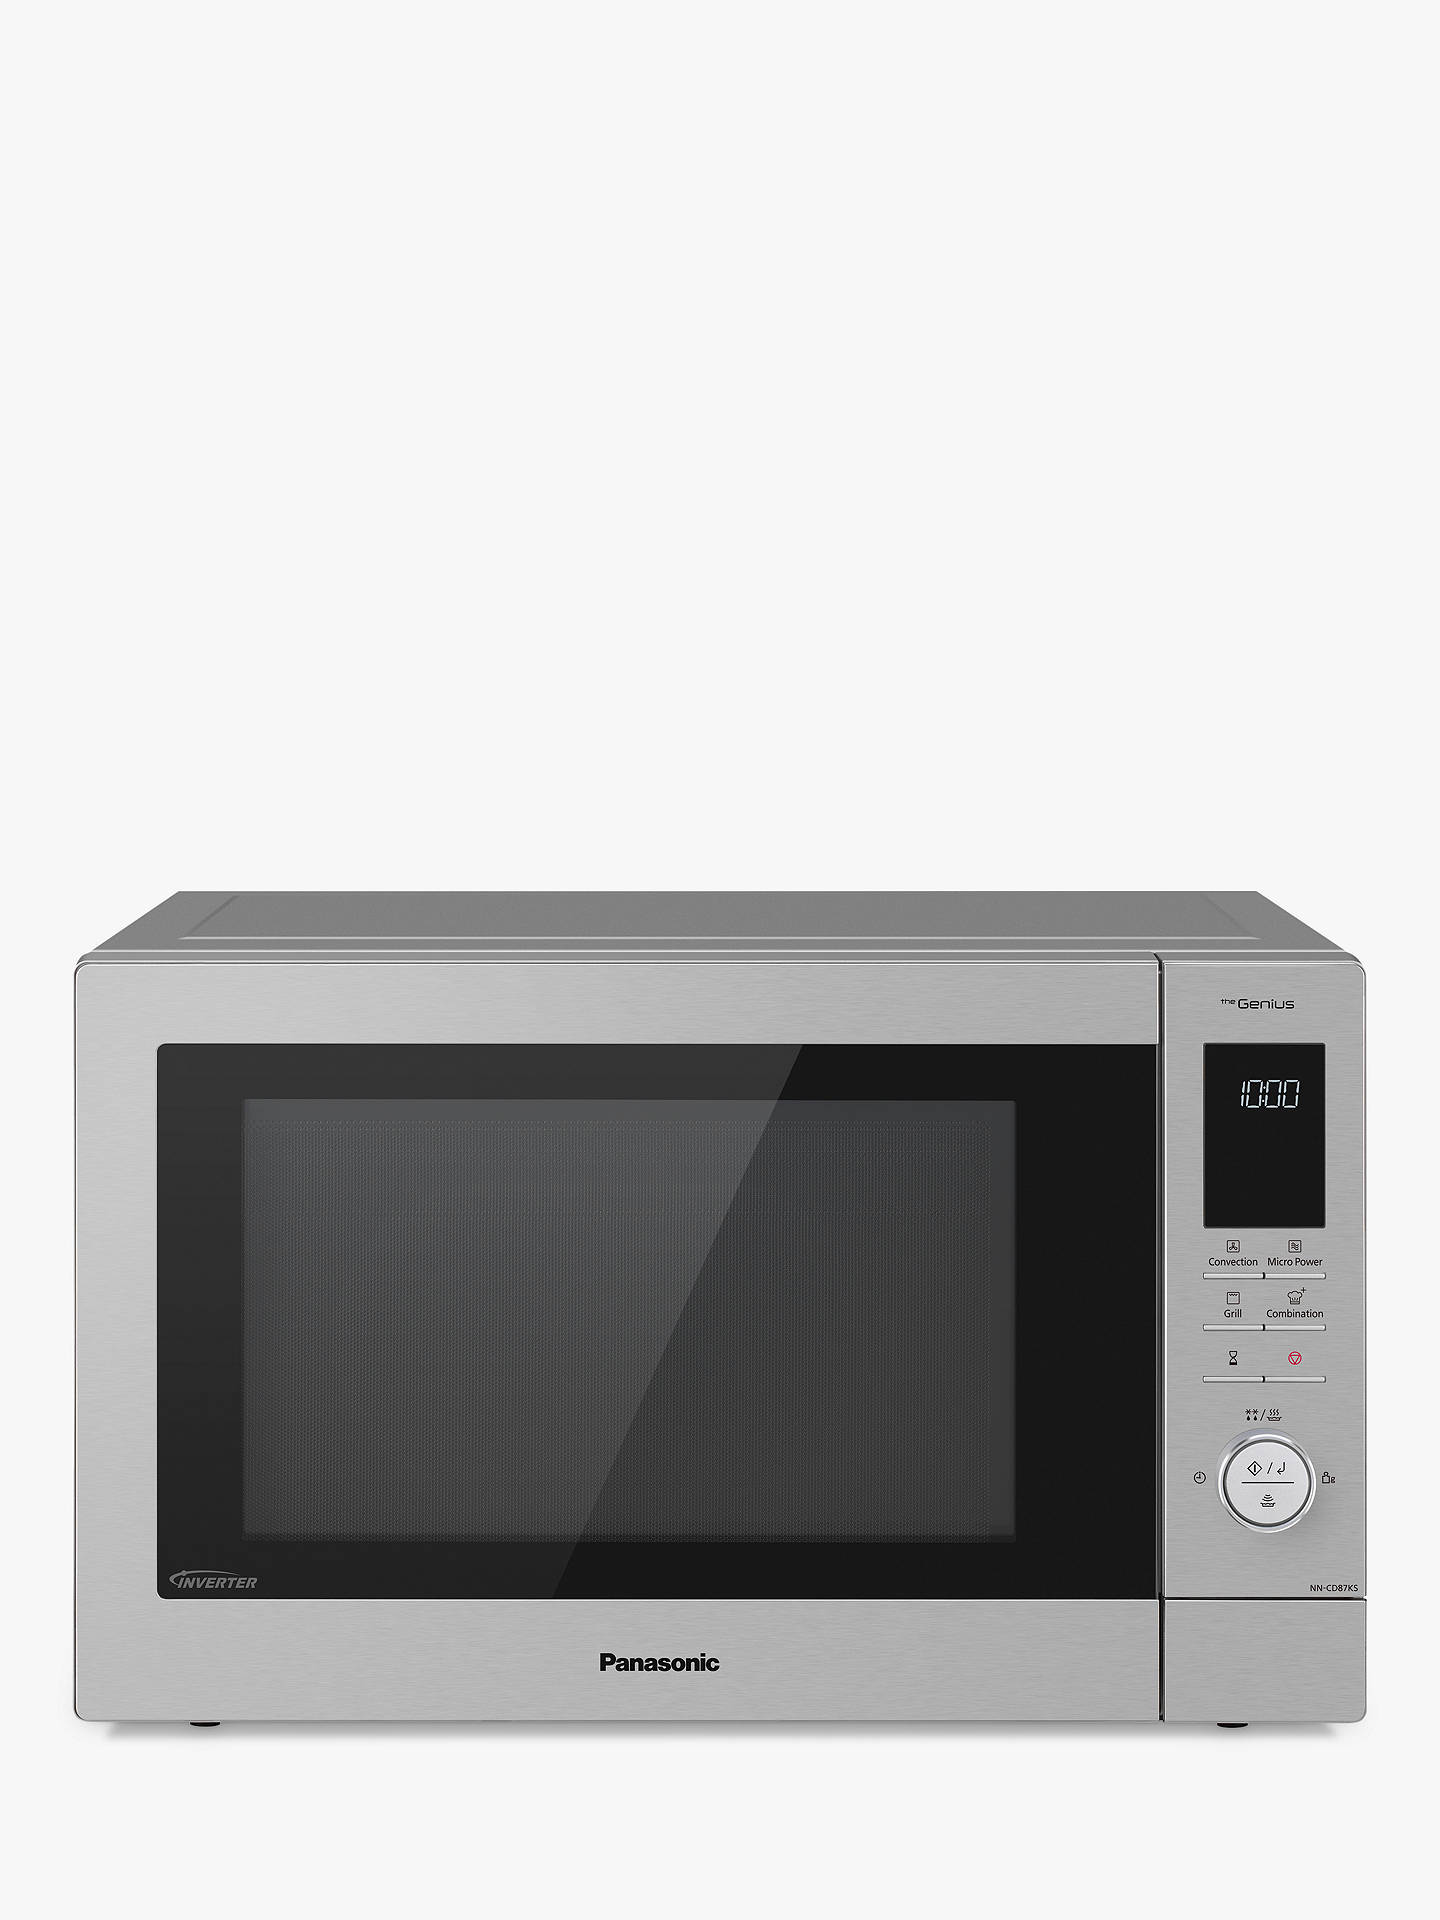 Panasonic Pro 2 Microwave Manual Bestmicrowave